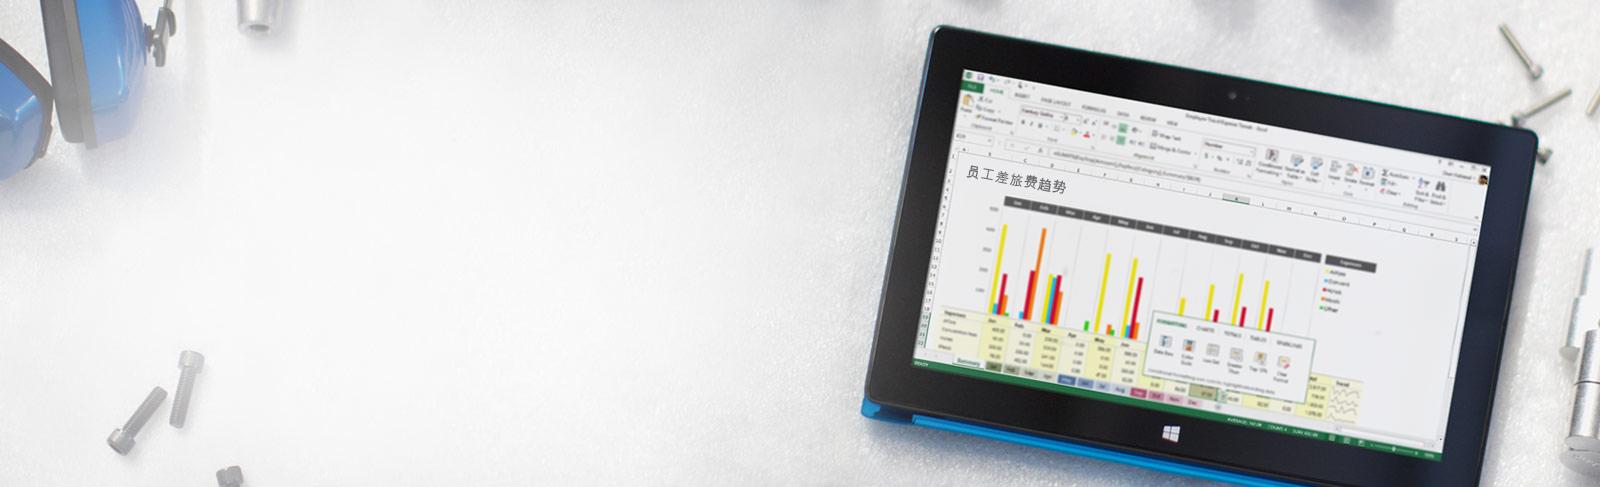 Office 365 - 可以信赖的商业工具。无论何时。无论何地。